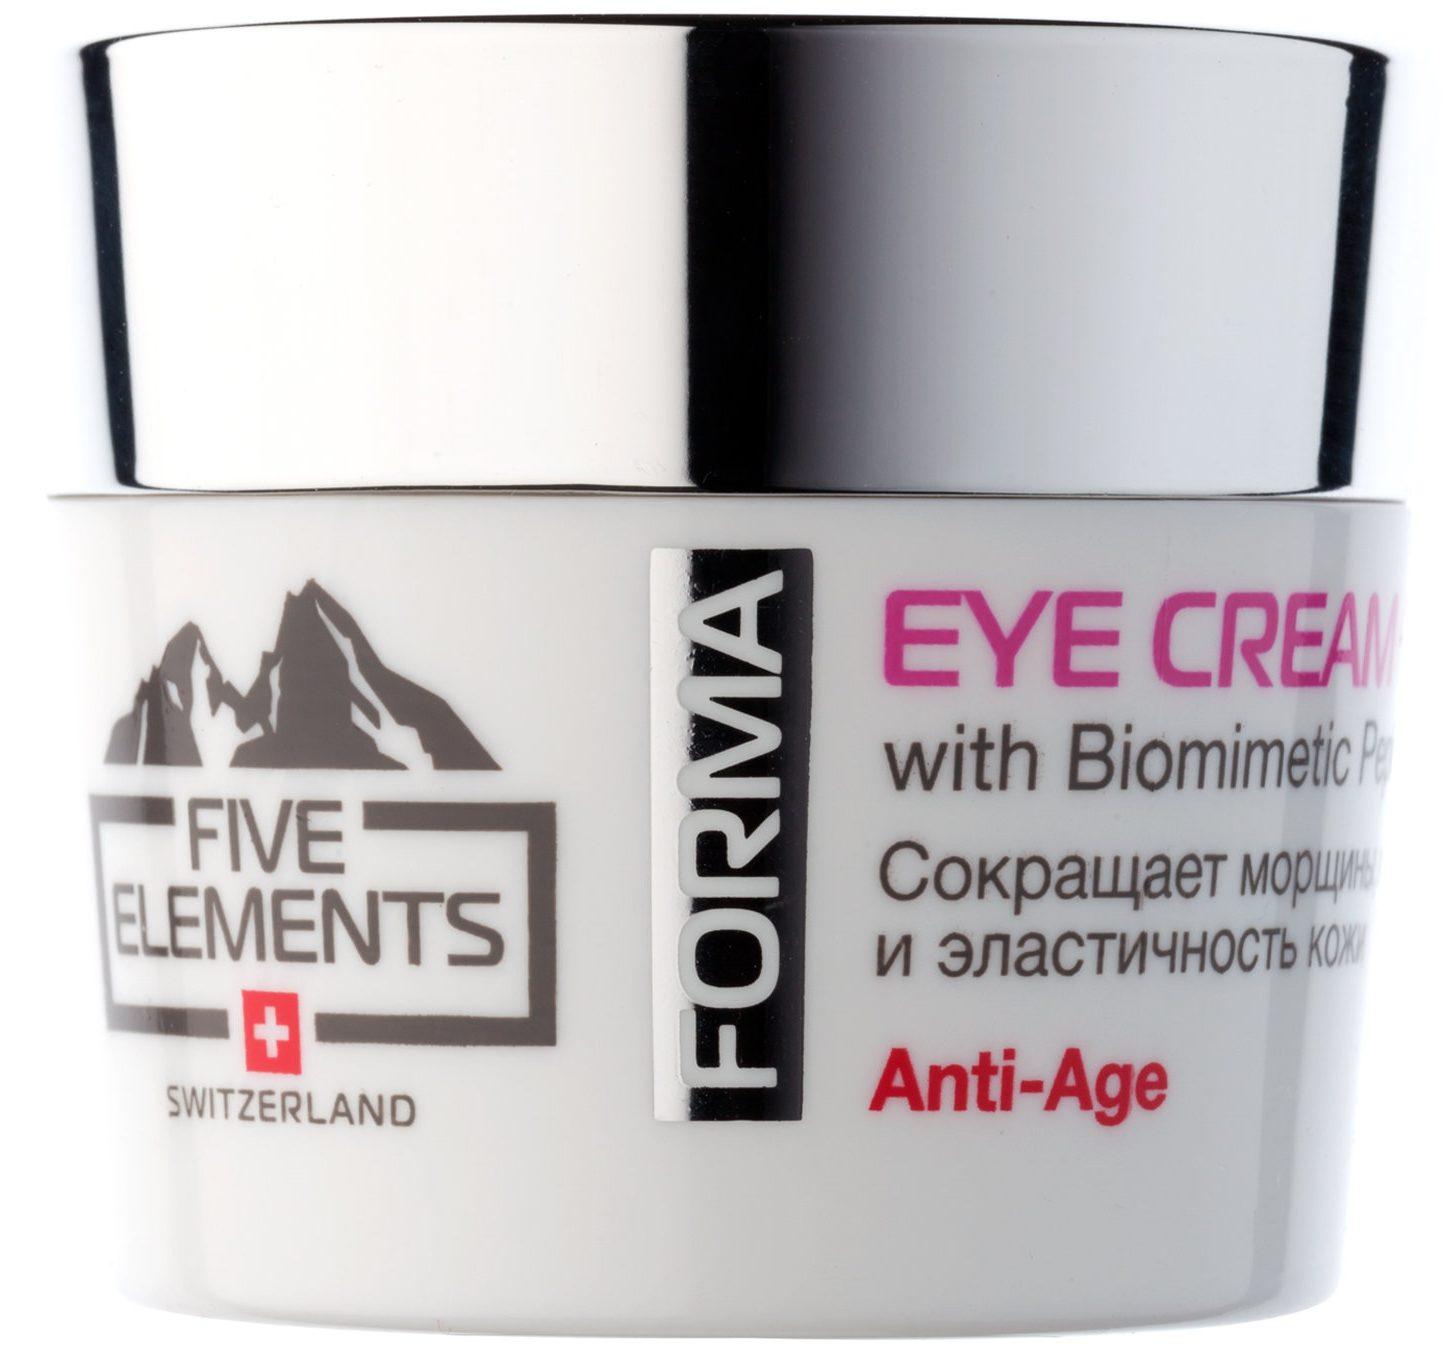 Five Elements Intensive Eye Cream